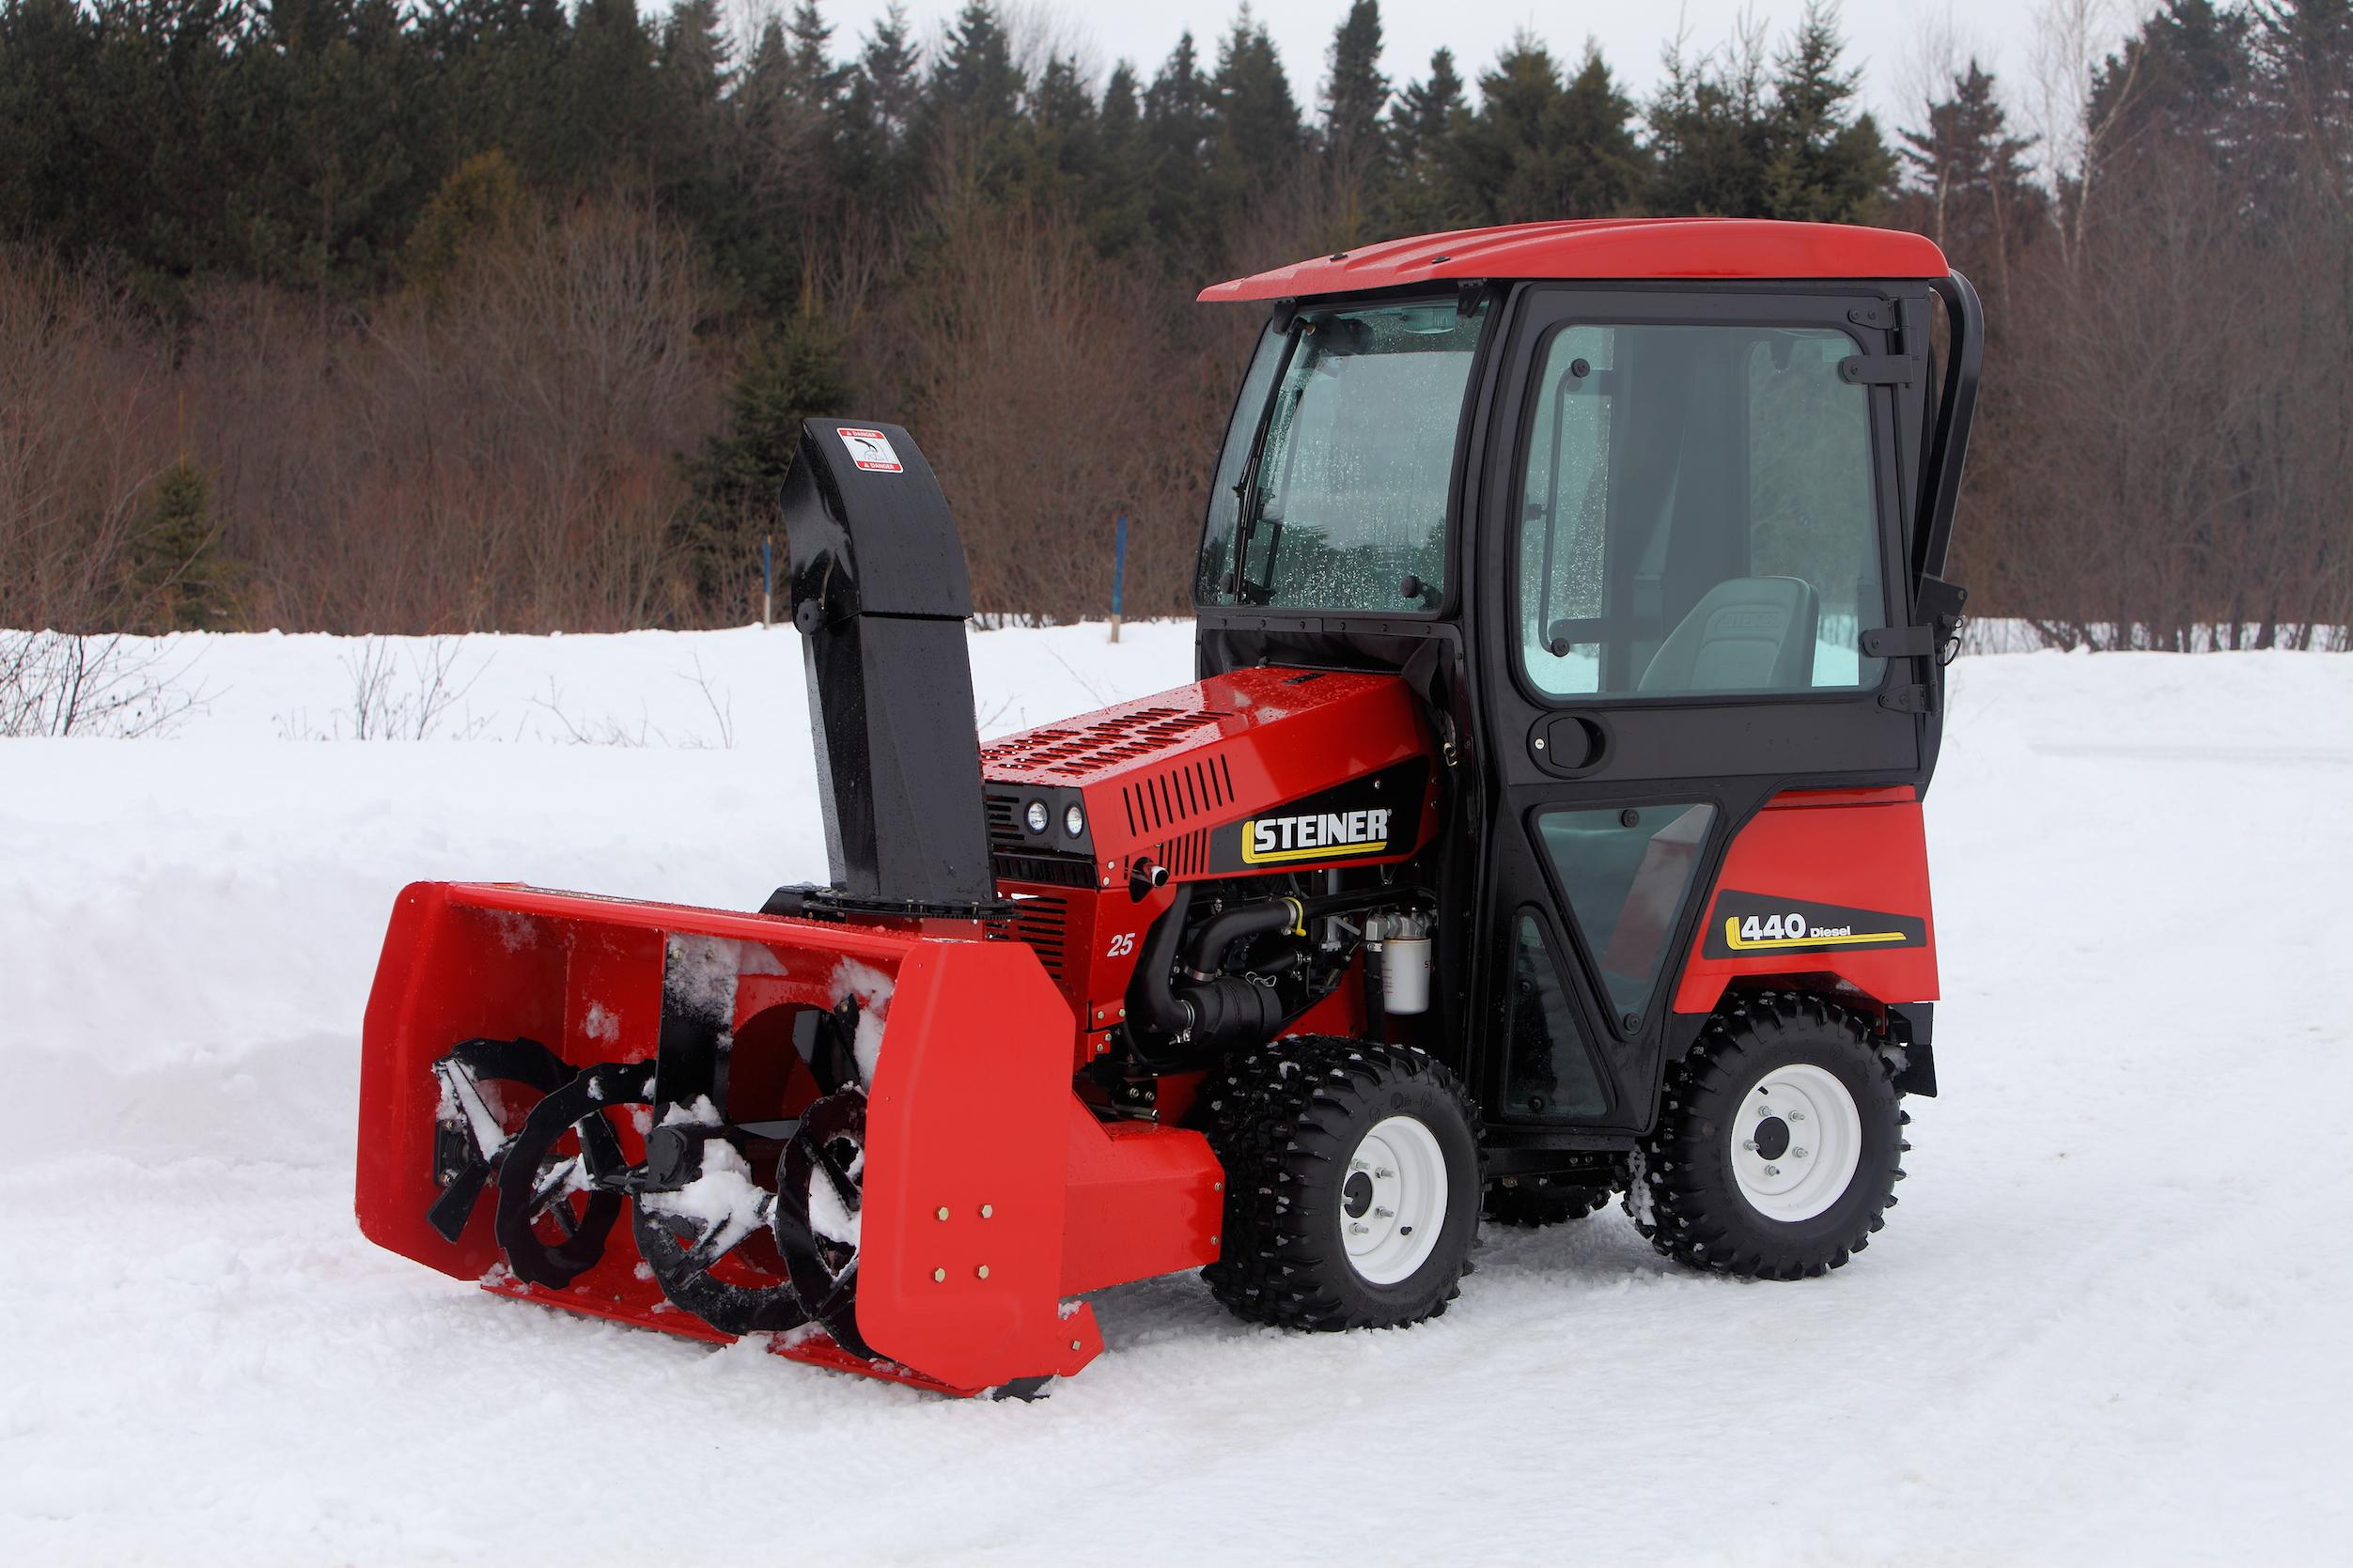 SB648 Professional Snow Blower